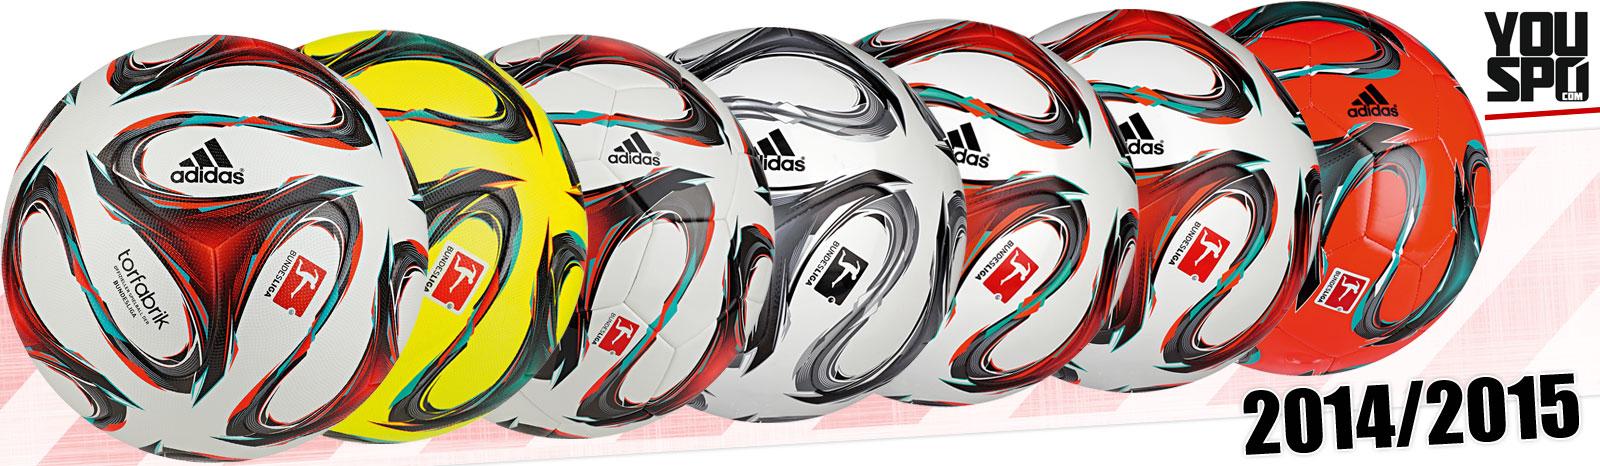 Adidas Torfabrik 2014/2015 Fußbälle